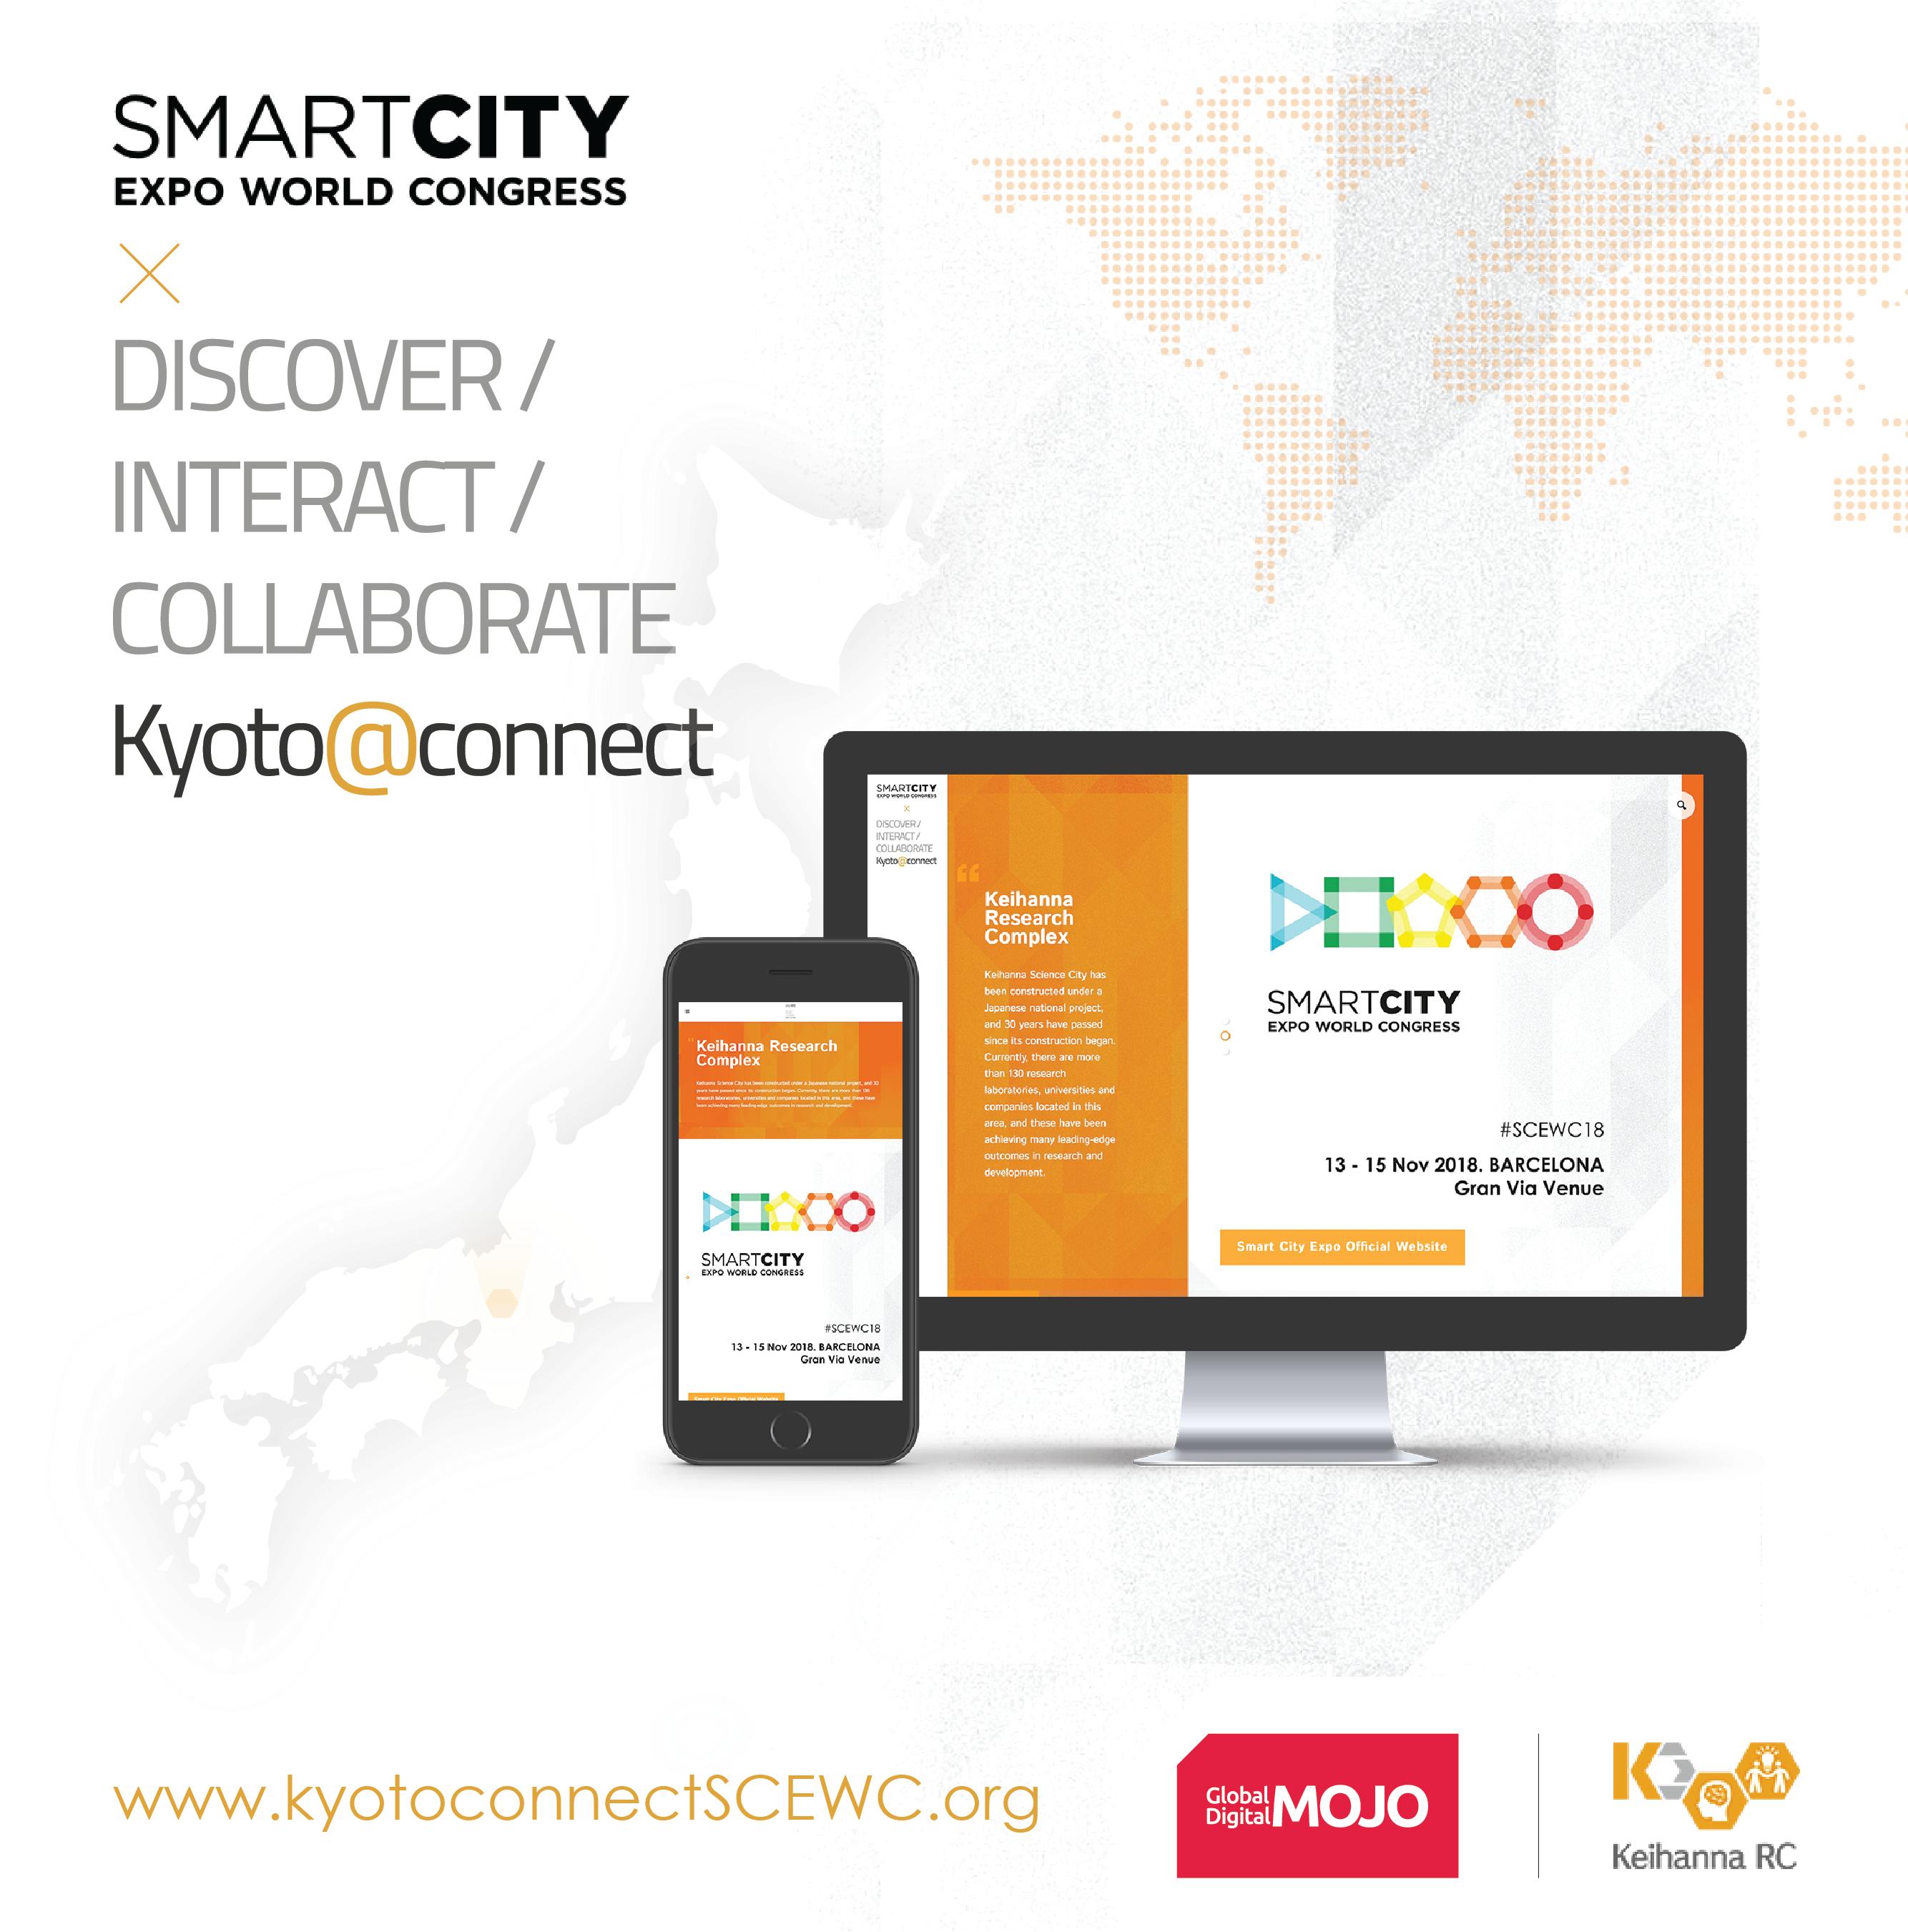 MOJO Launches the KeihannaRC Smart City Startup Campaign